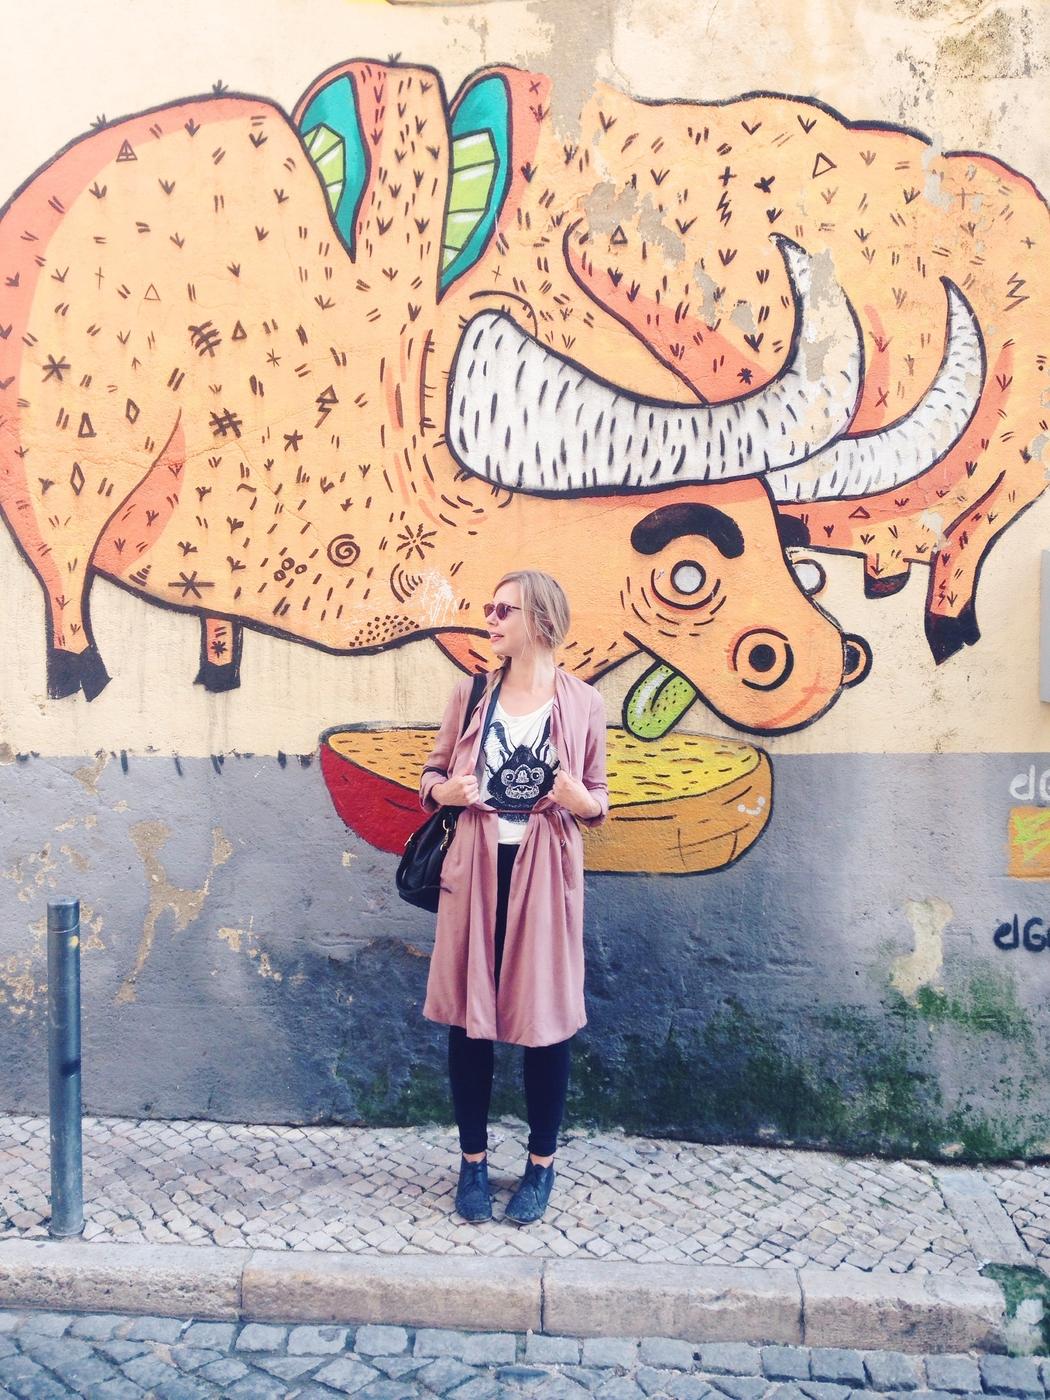 Nopeus dating Dresden Sonderbar